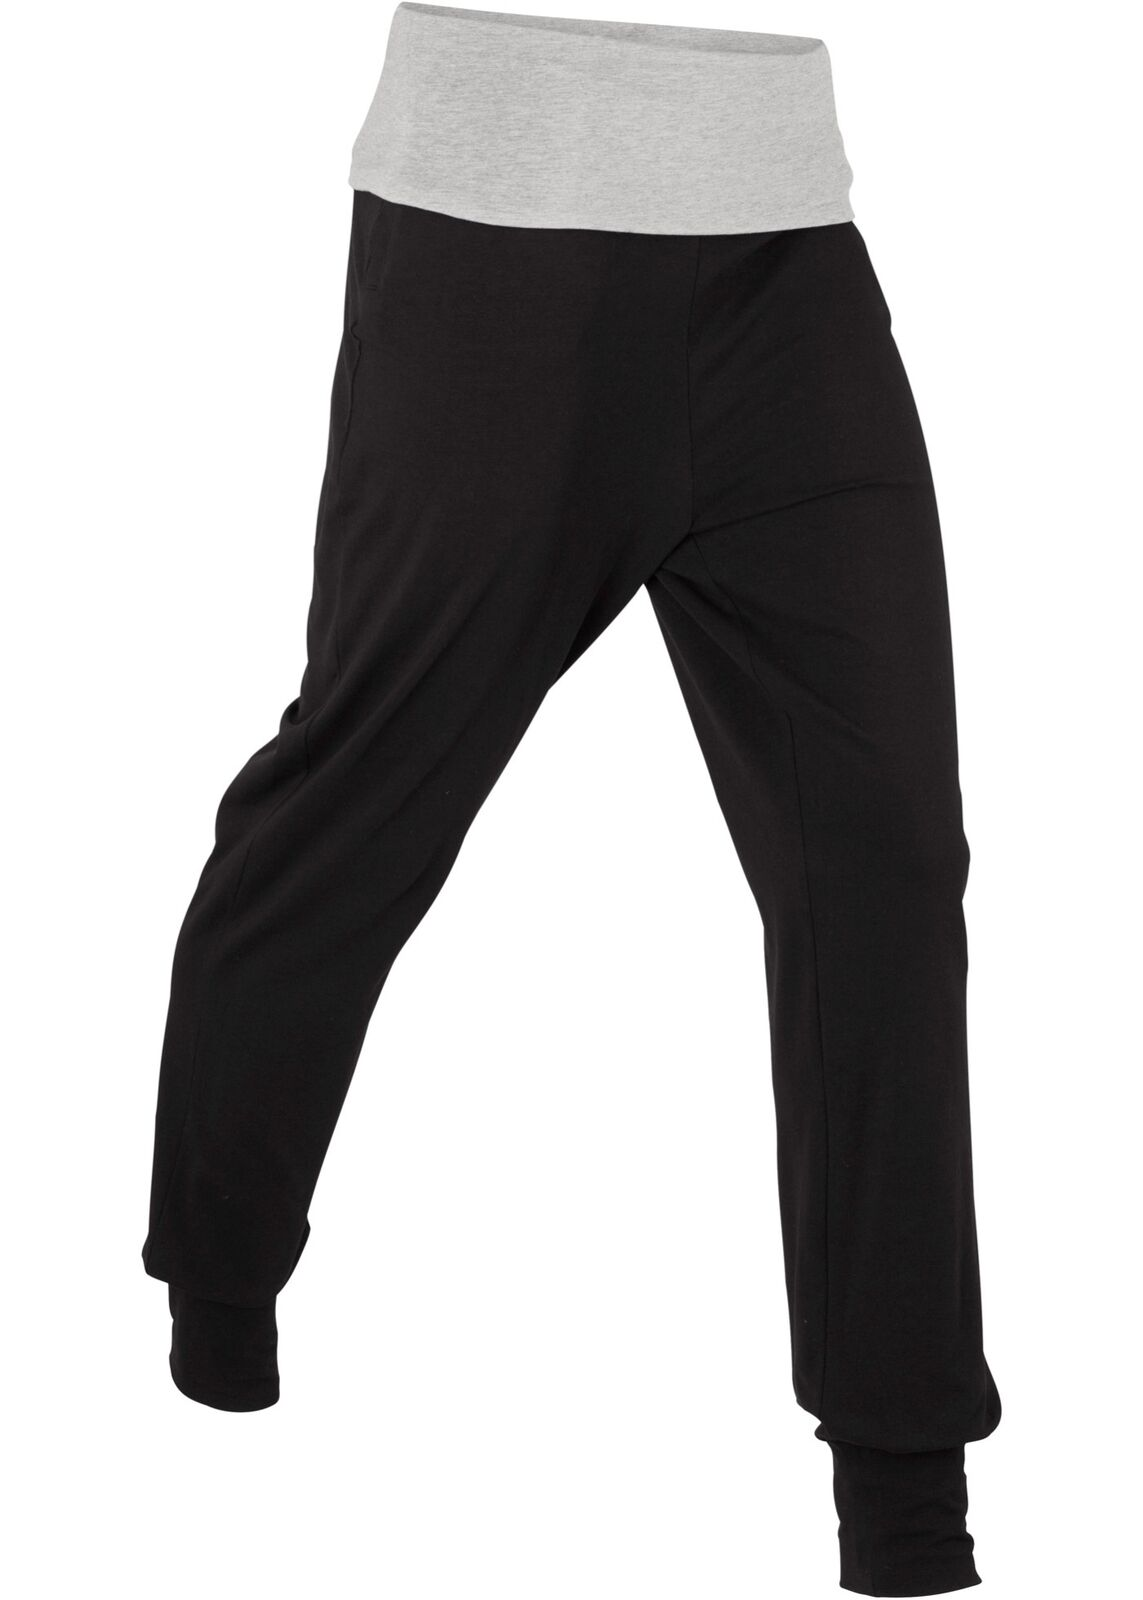 Loozykit Jogginghose f/ür Frauen Jogging-Hose Damen Hohe Taille Lang Sweat Hose Gem/ütliche Sport-Hose Enger Beinabschluss Trainings-Hose Casual